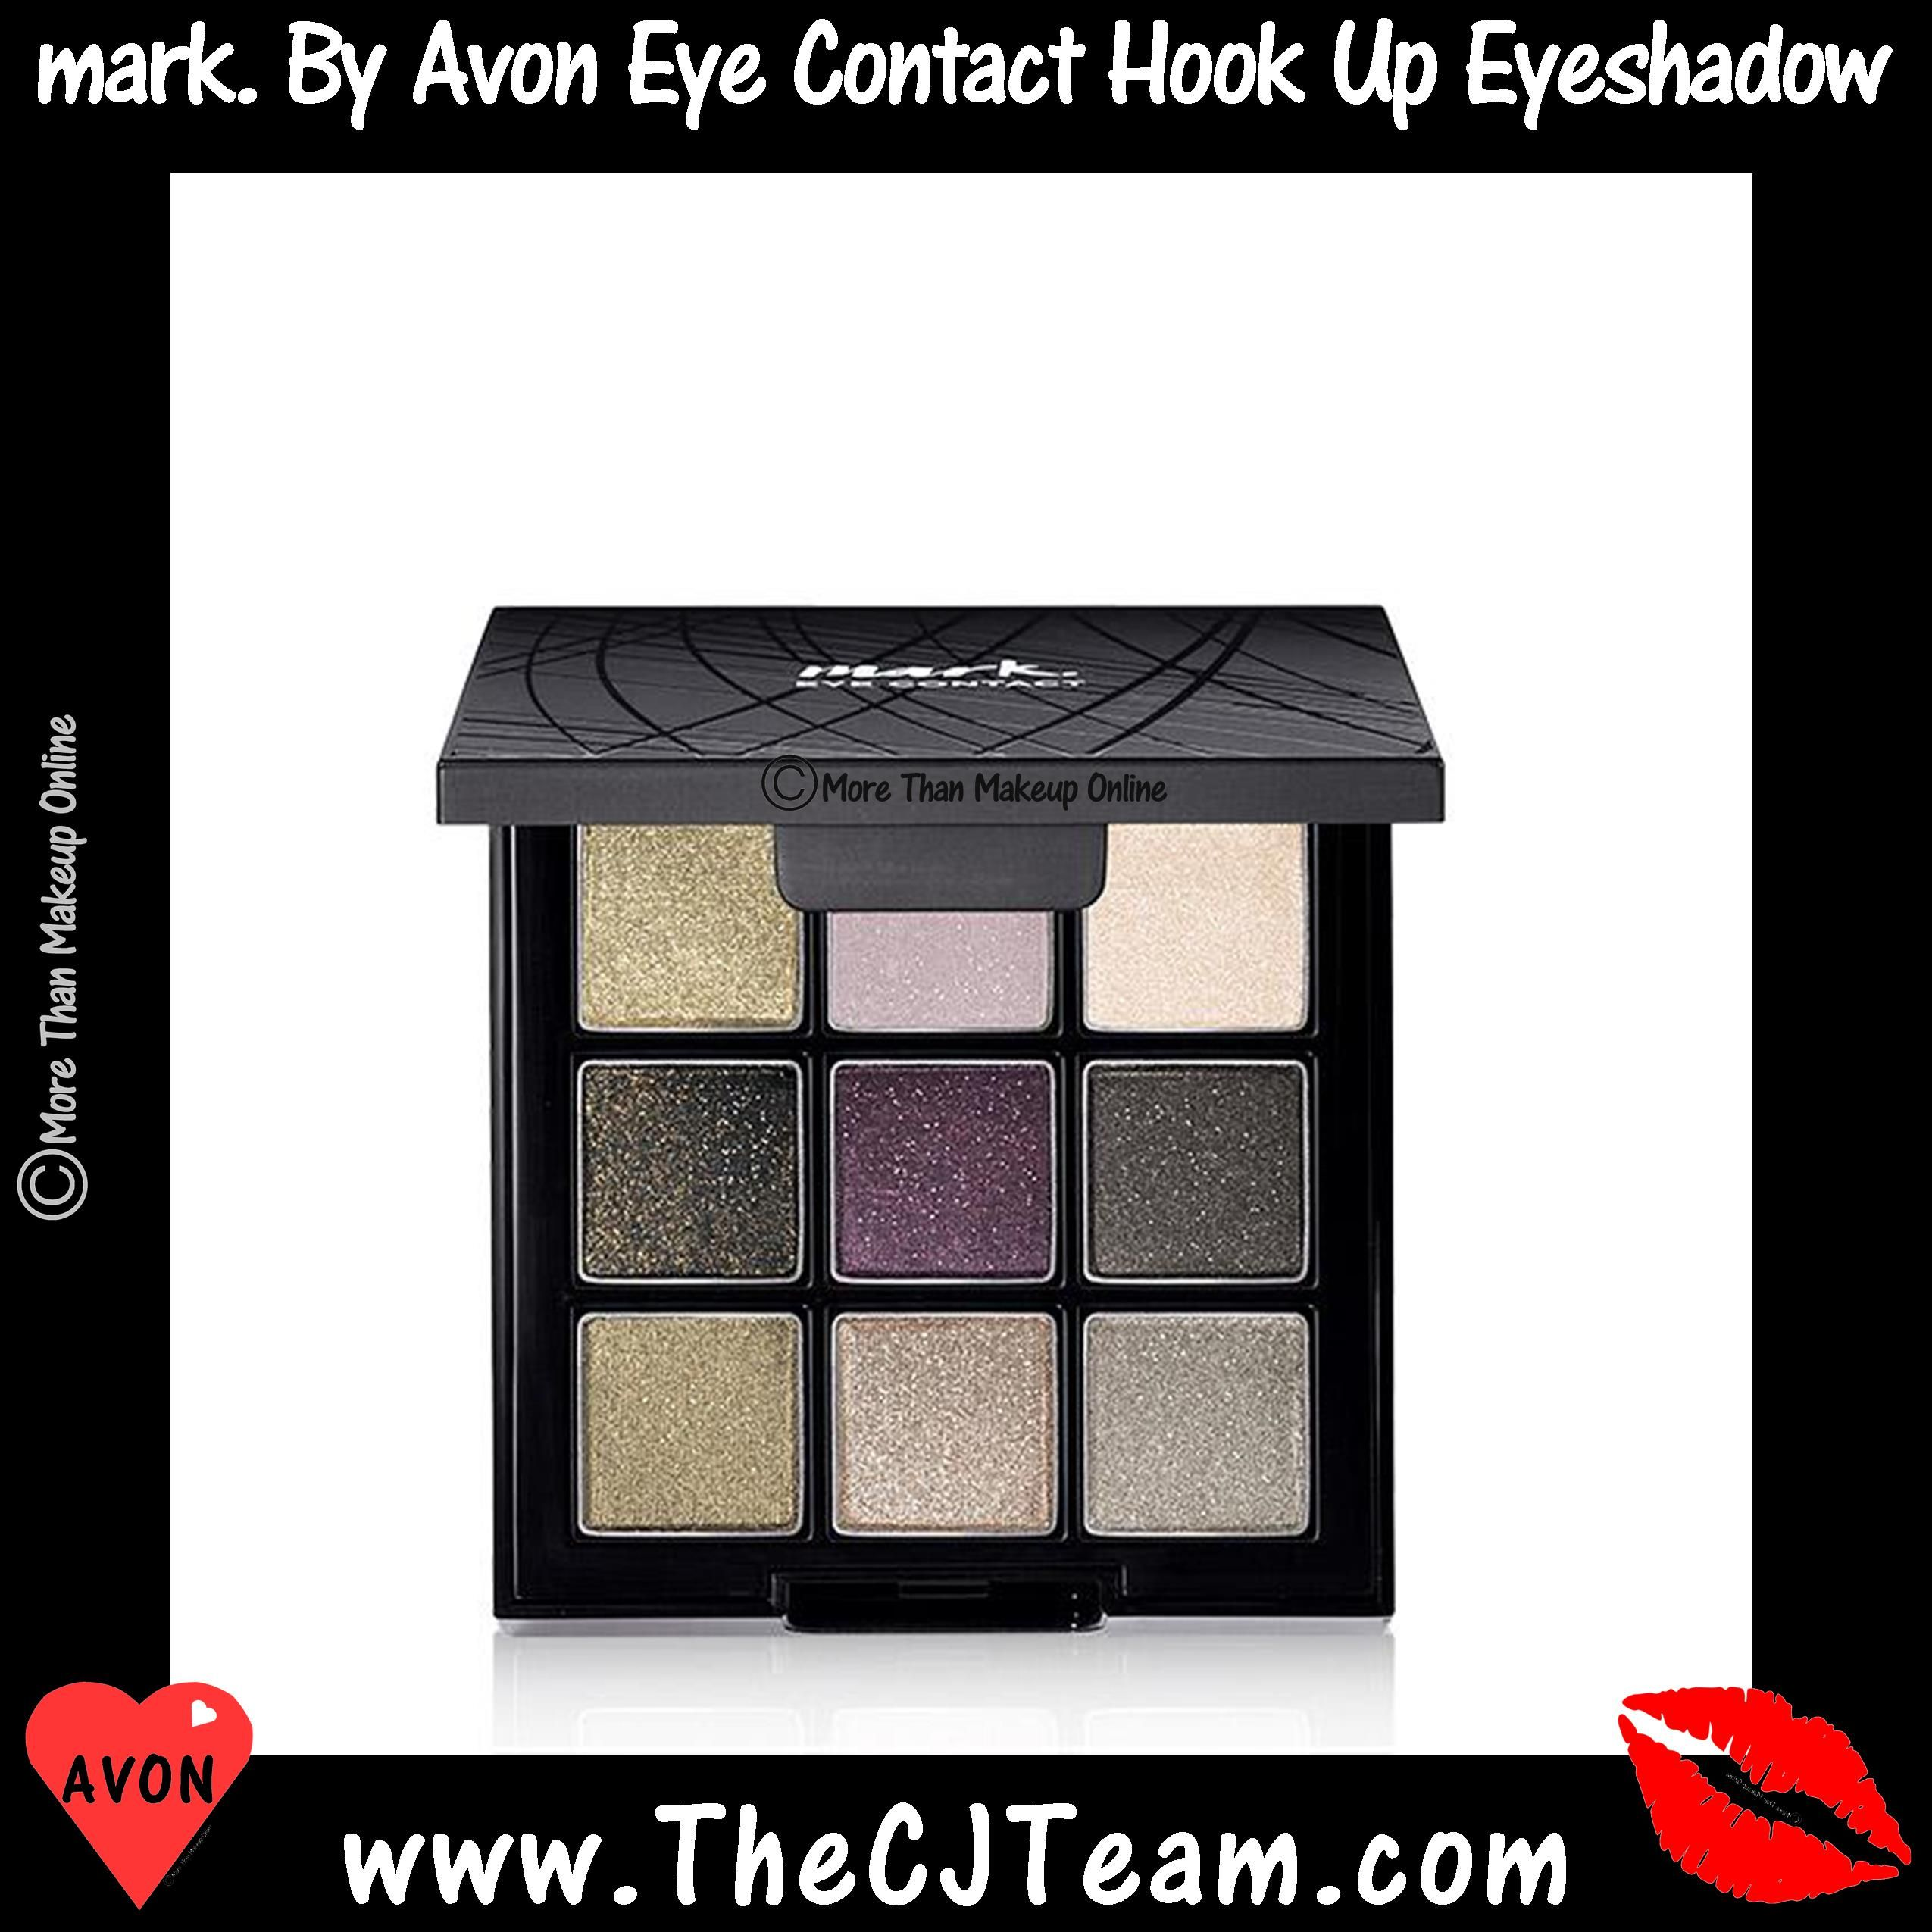 mark. By Avon Eye Contact Hook Up Eyeshadow Palette. Avon